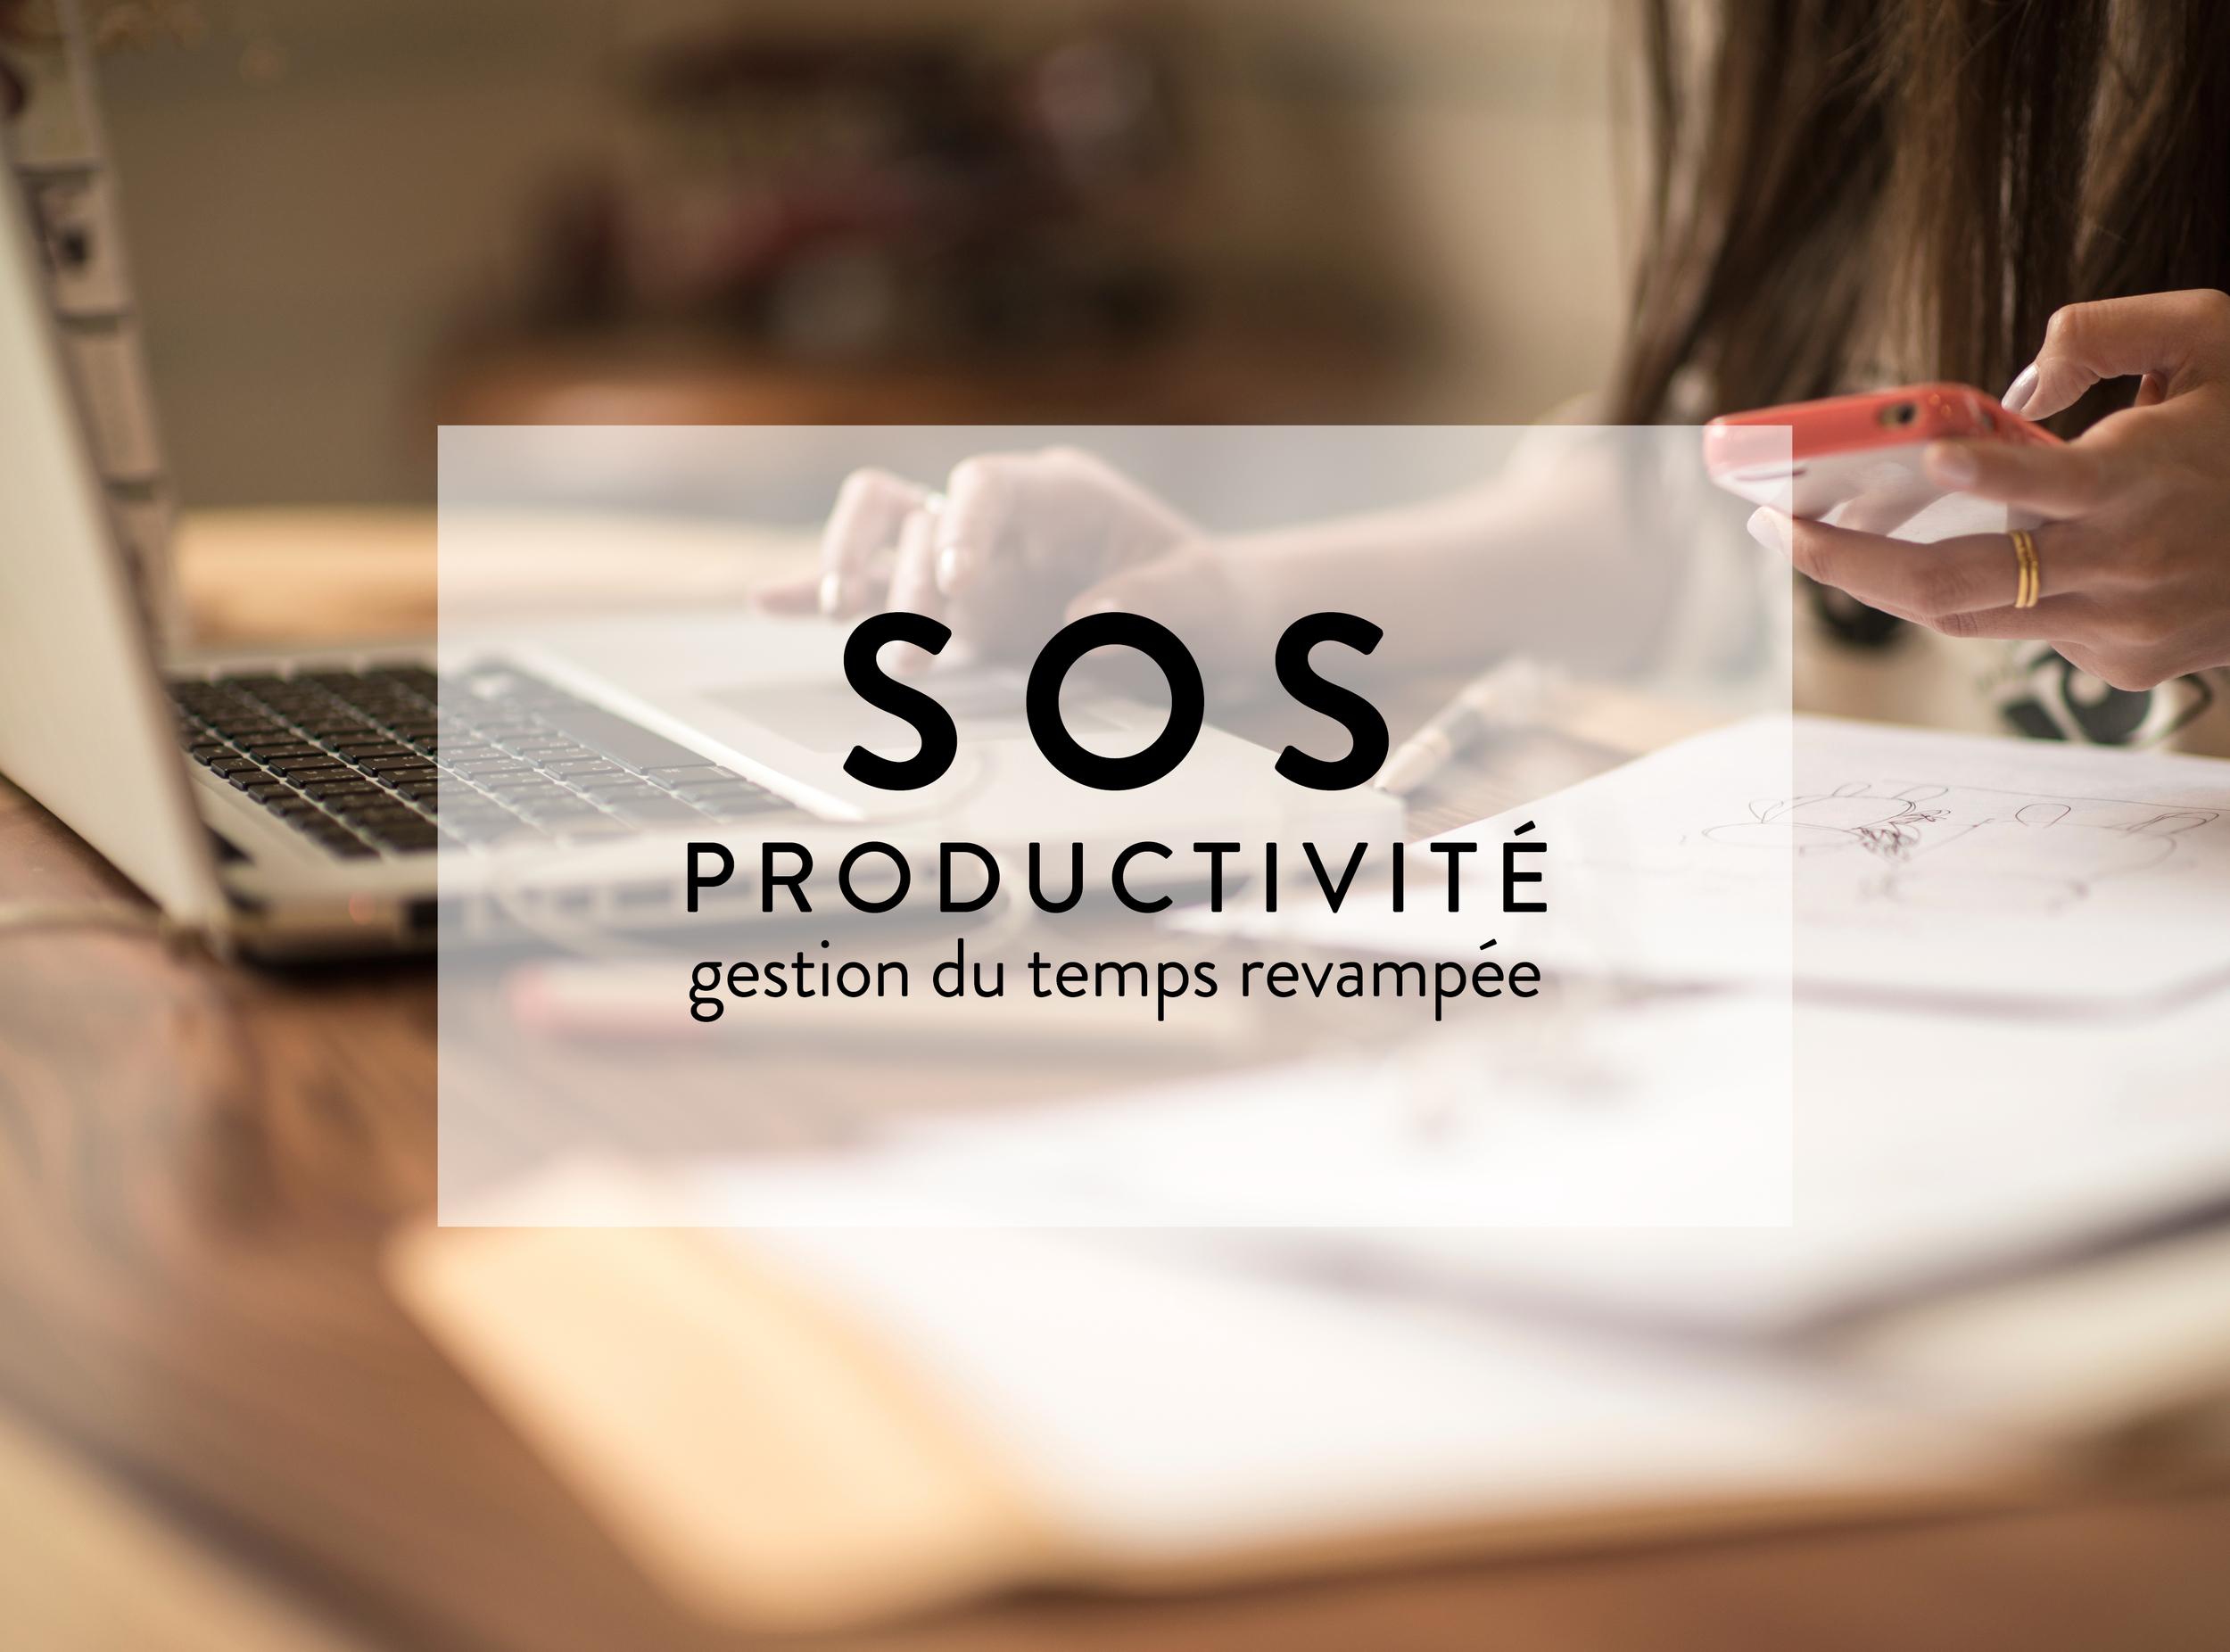 Cohesion_Coaching_Programme_Coaching_SOS_Productivite.jpg